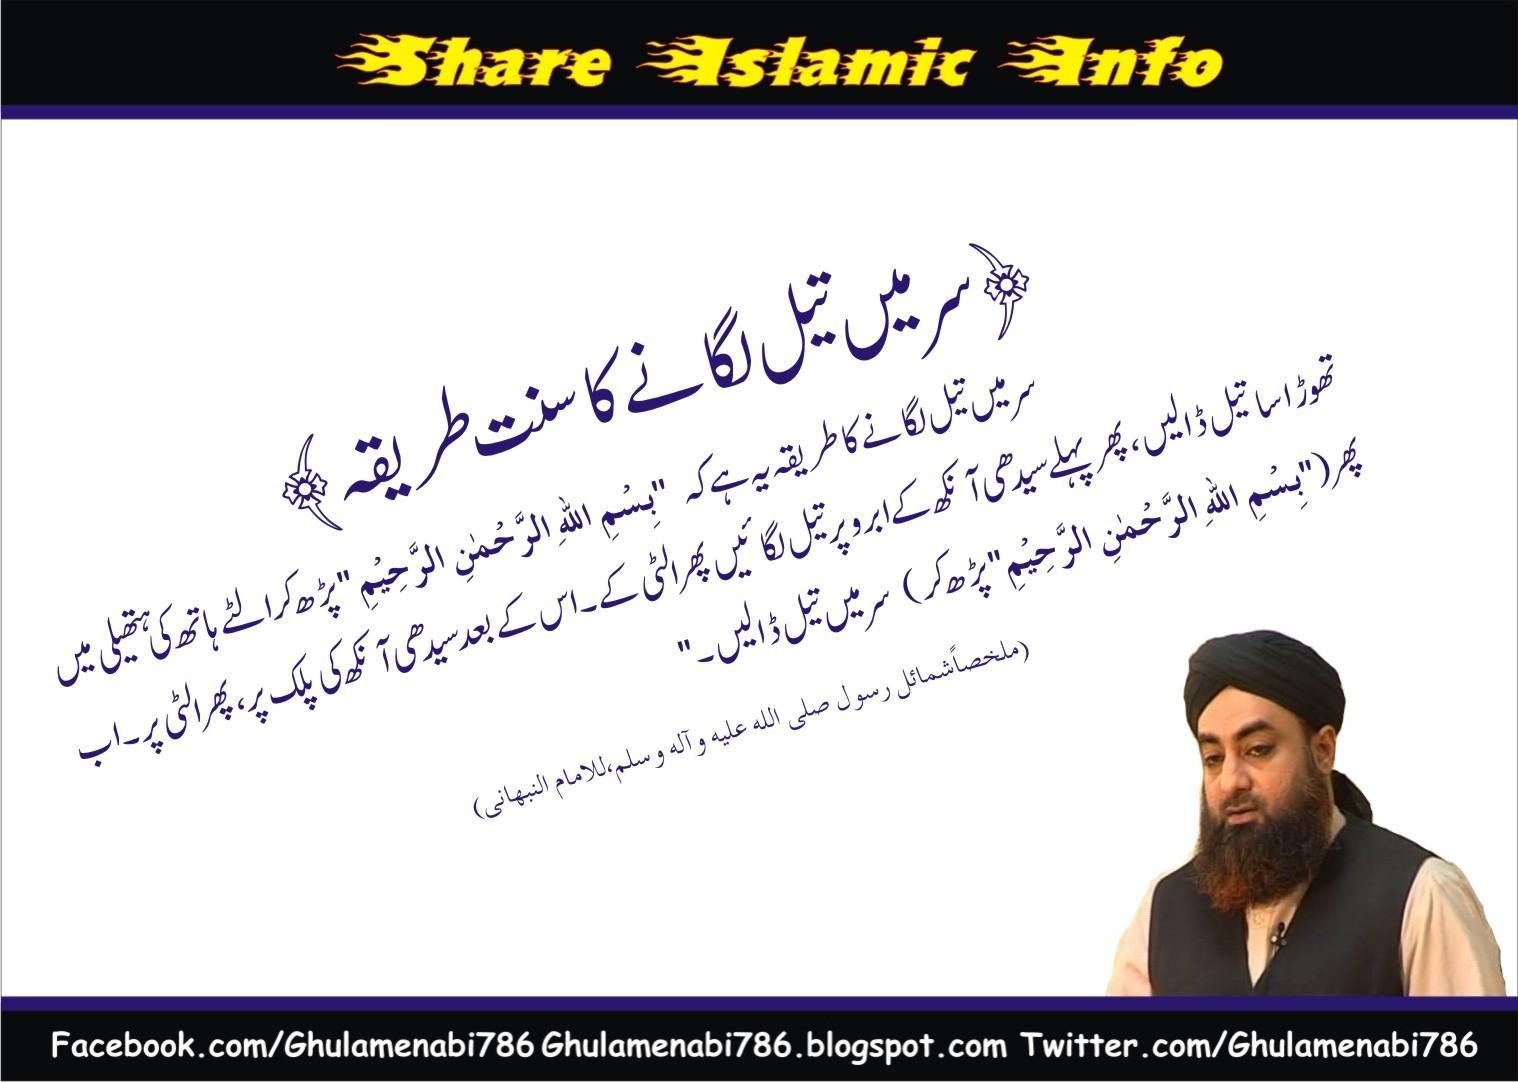 islamic images of hadees e pak in urdu ahades 7 hadees free